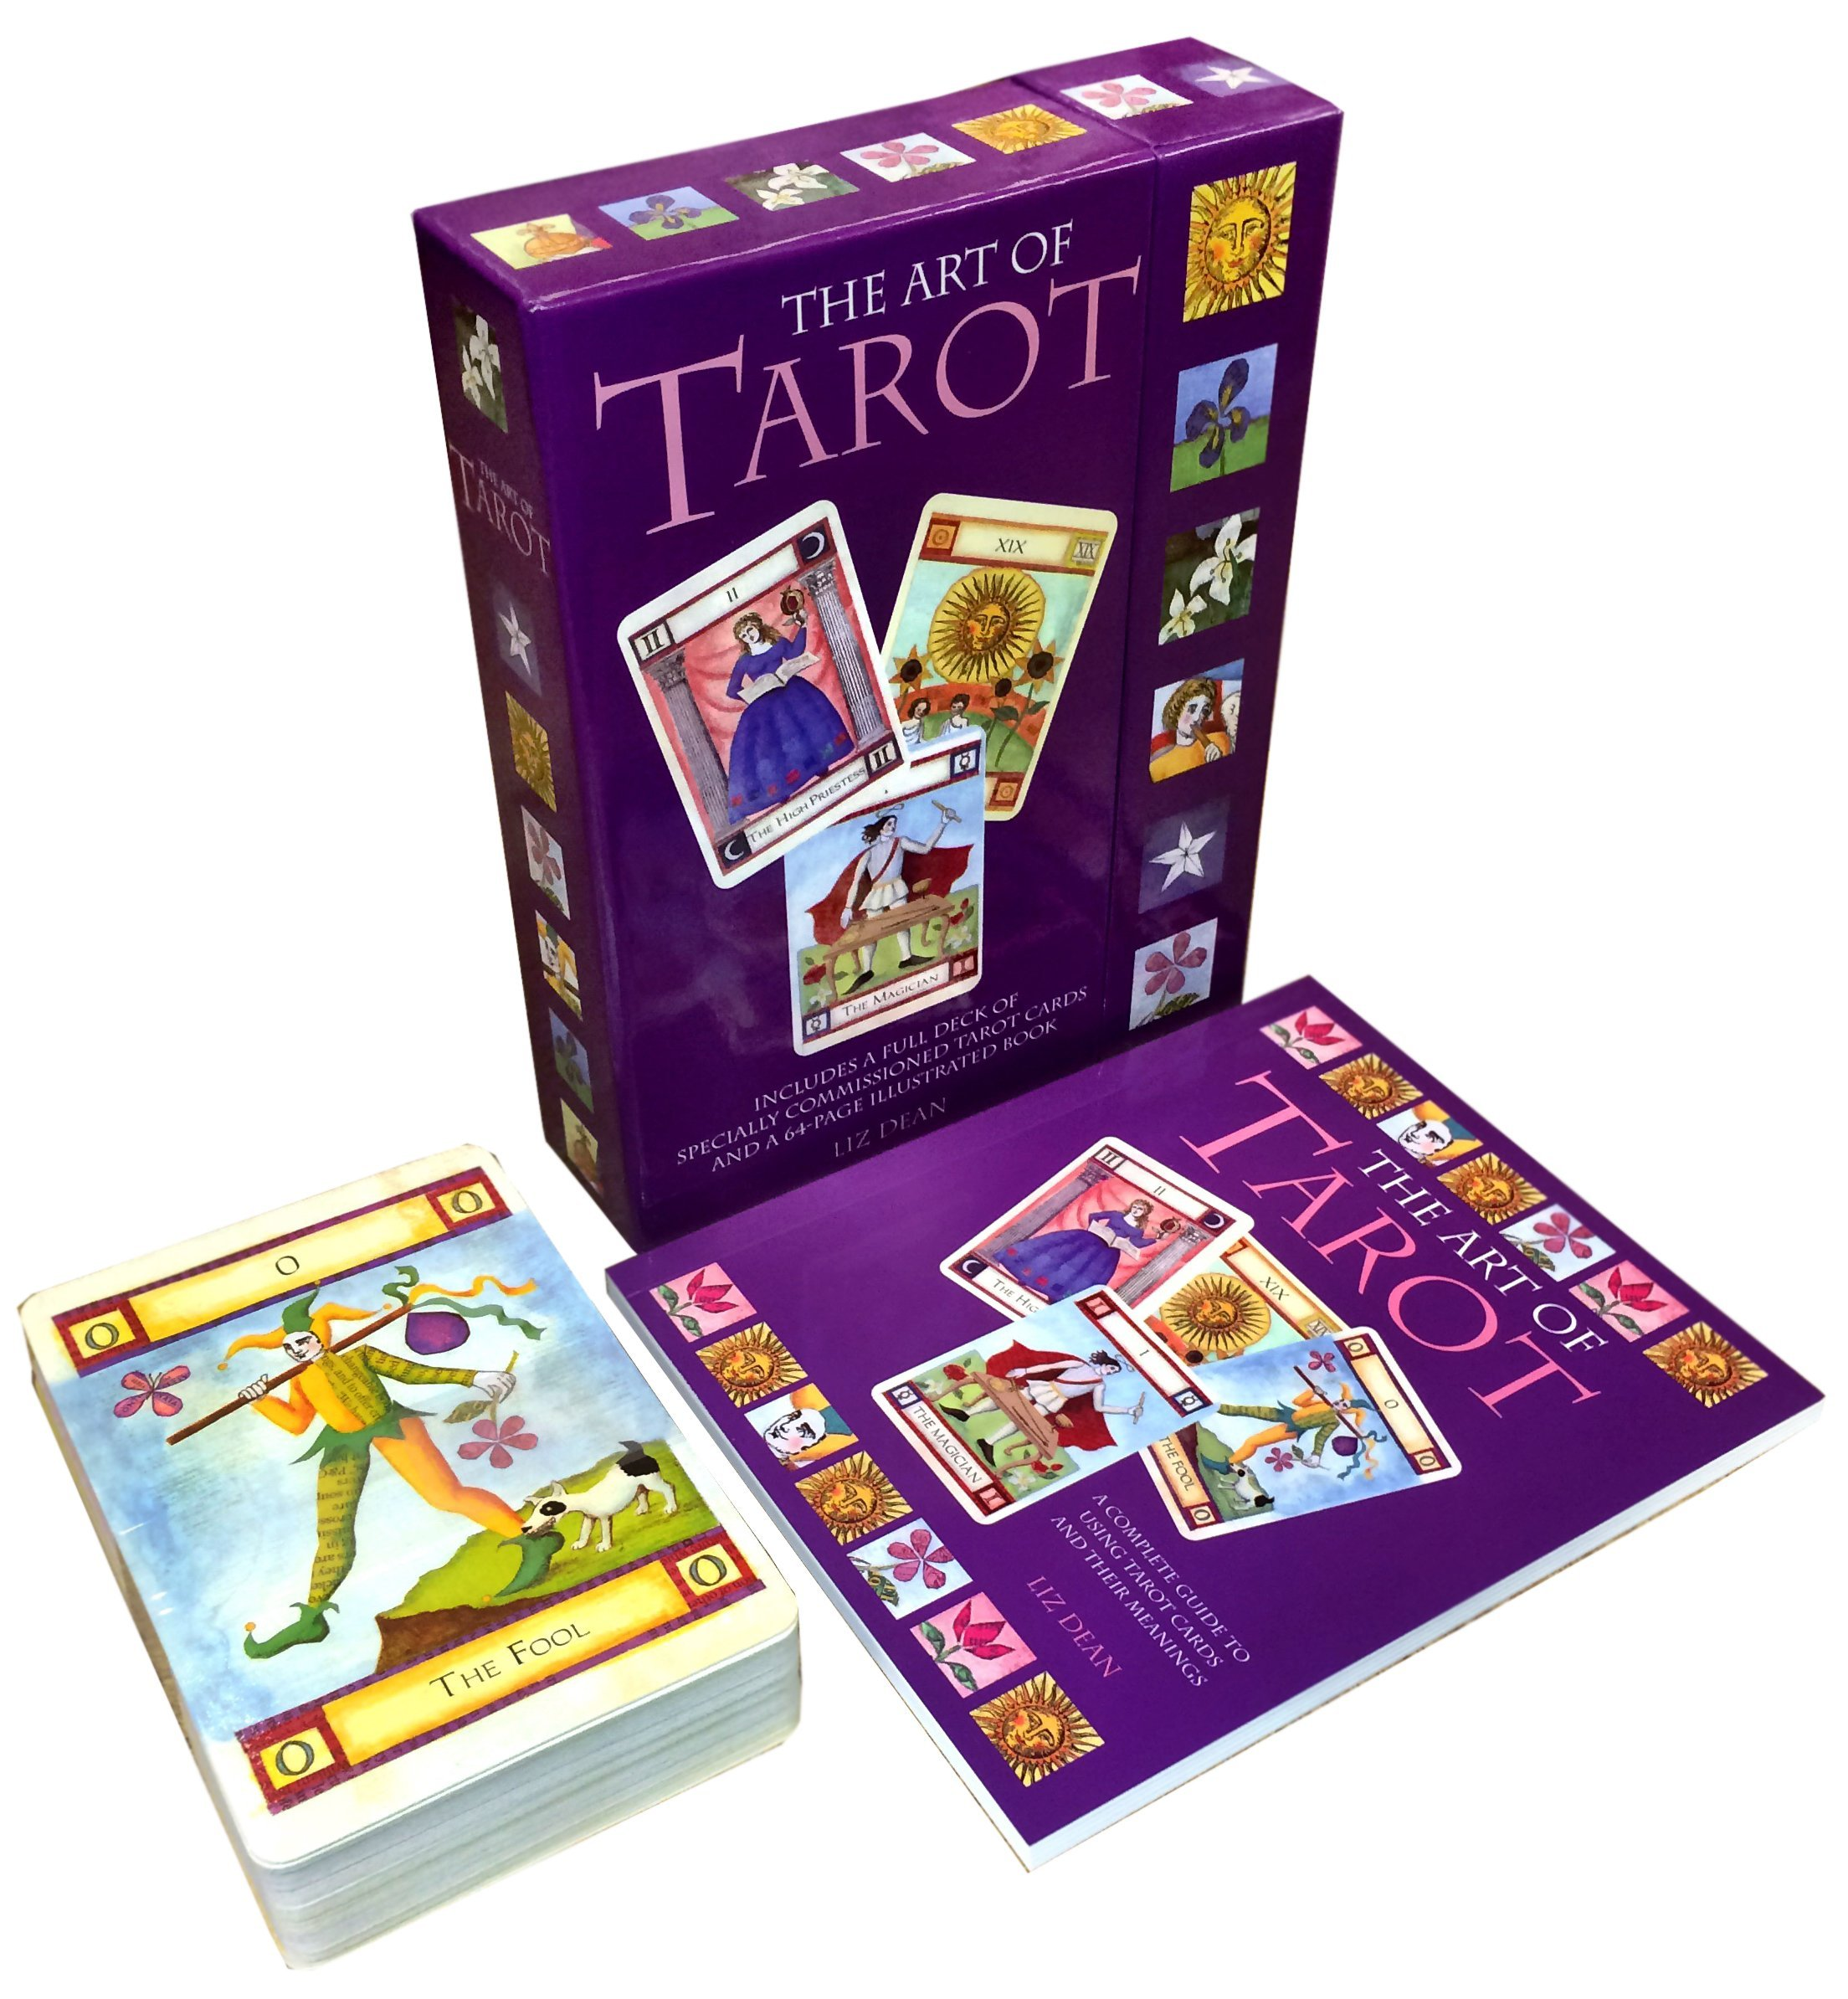 Tarot Cards Deck 78 Cards Collection Box Gift Set Mind Body Spirit Love Relati